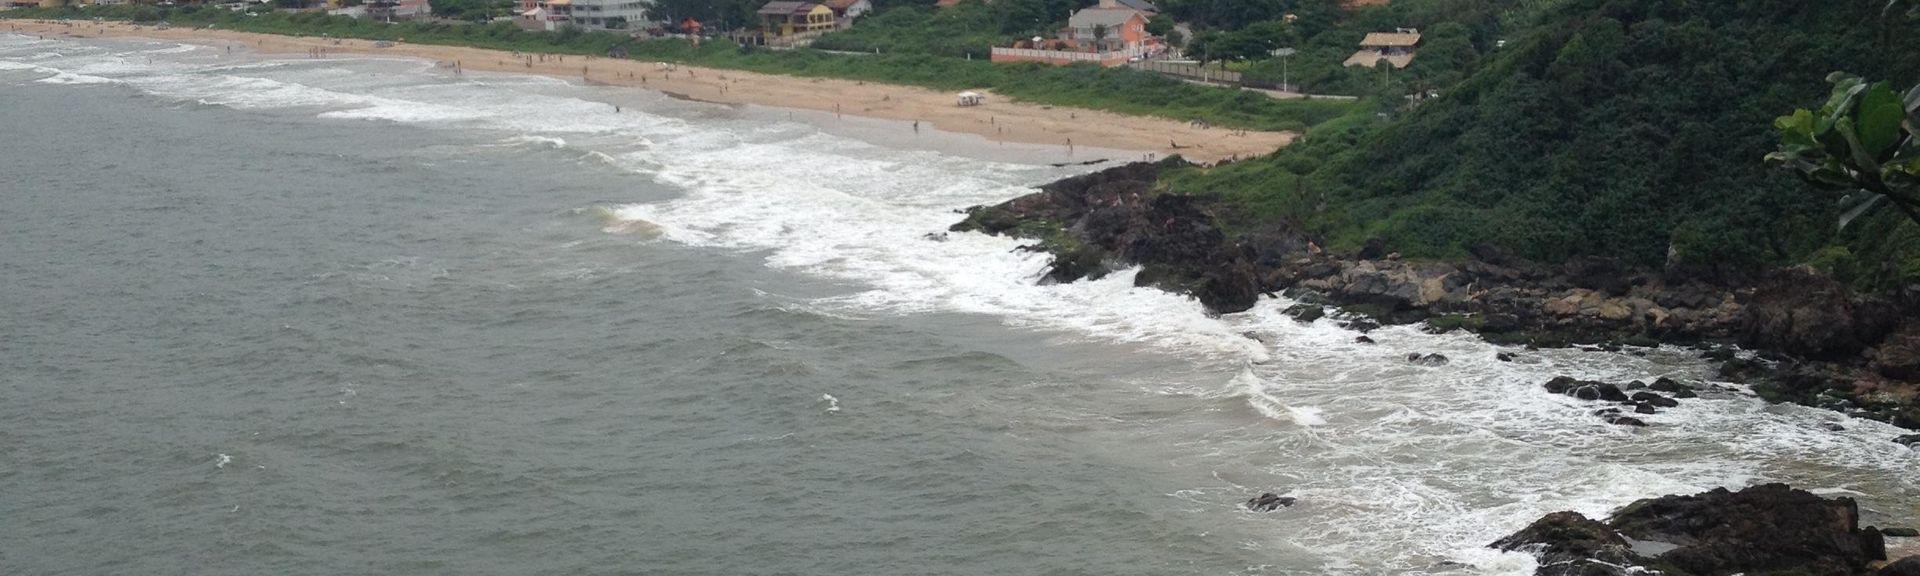 Navegantes, Região Sul, Brasil